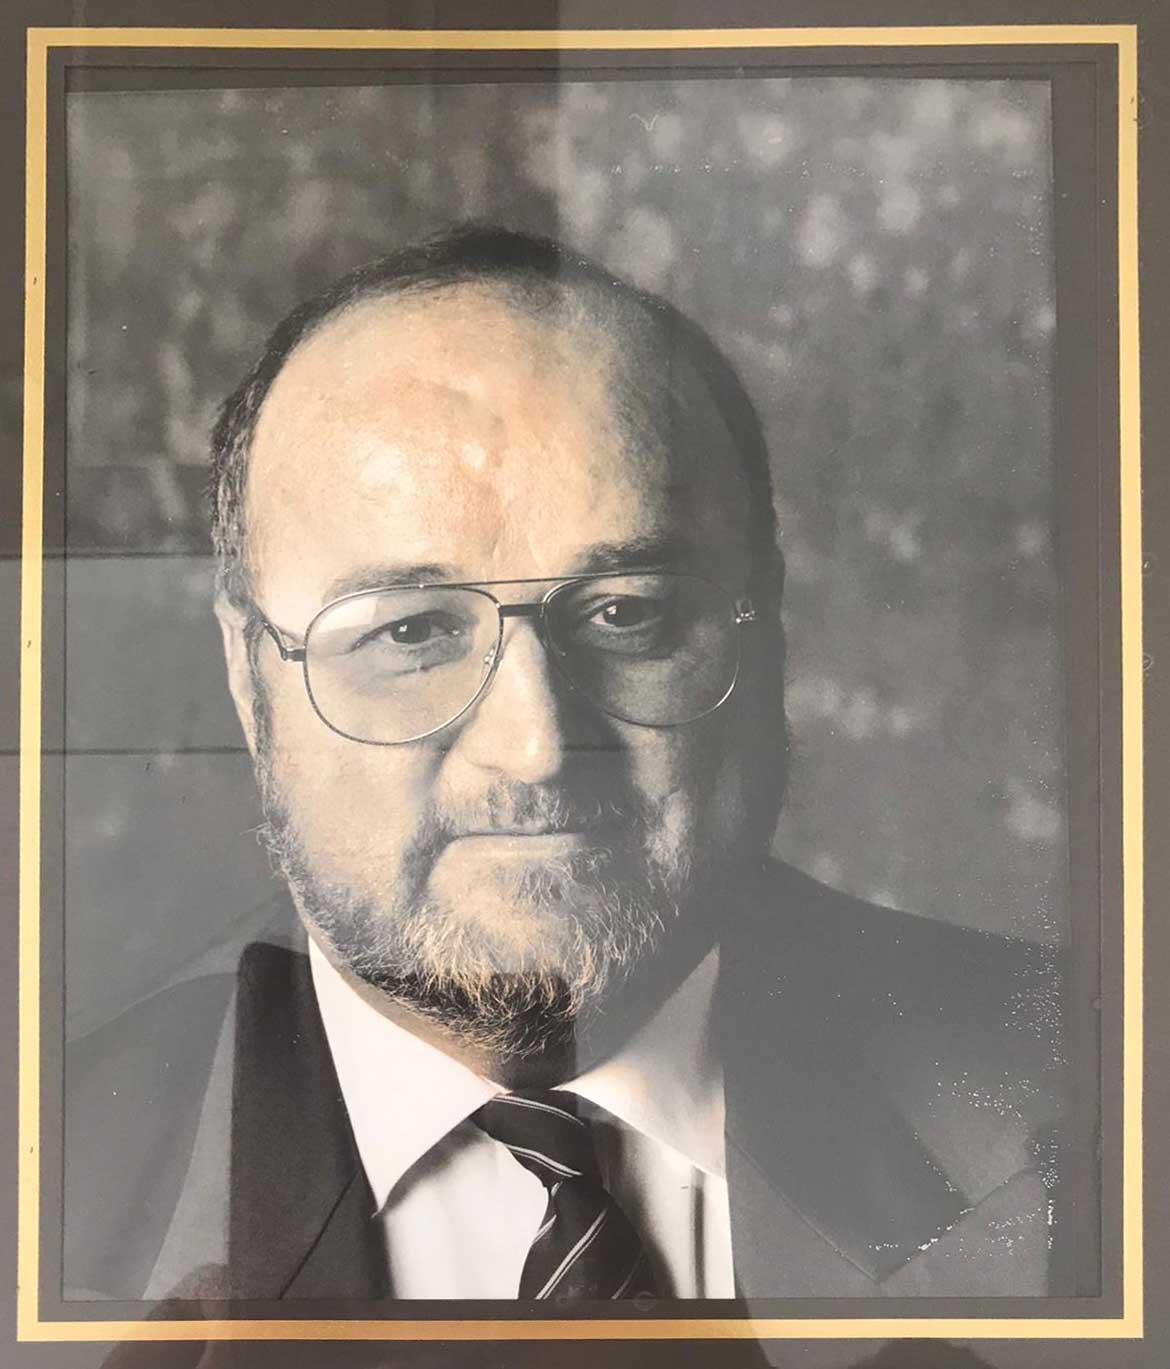 Arthur Gerard Rackstraw